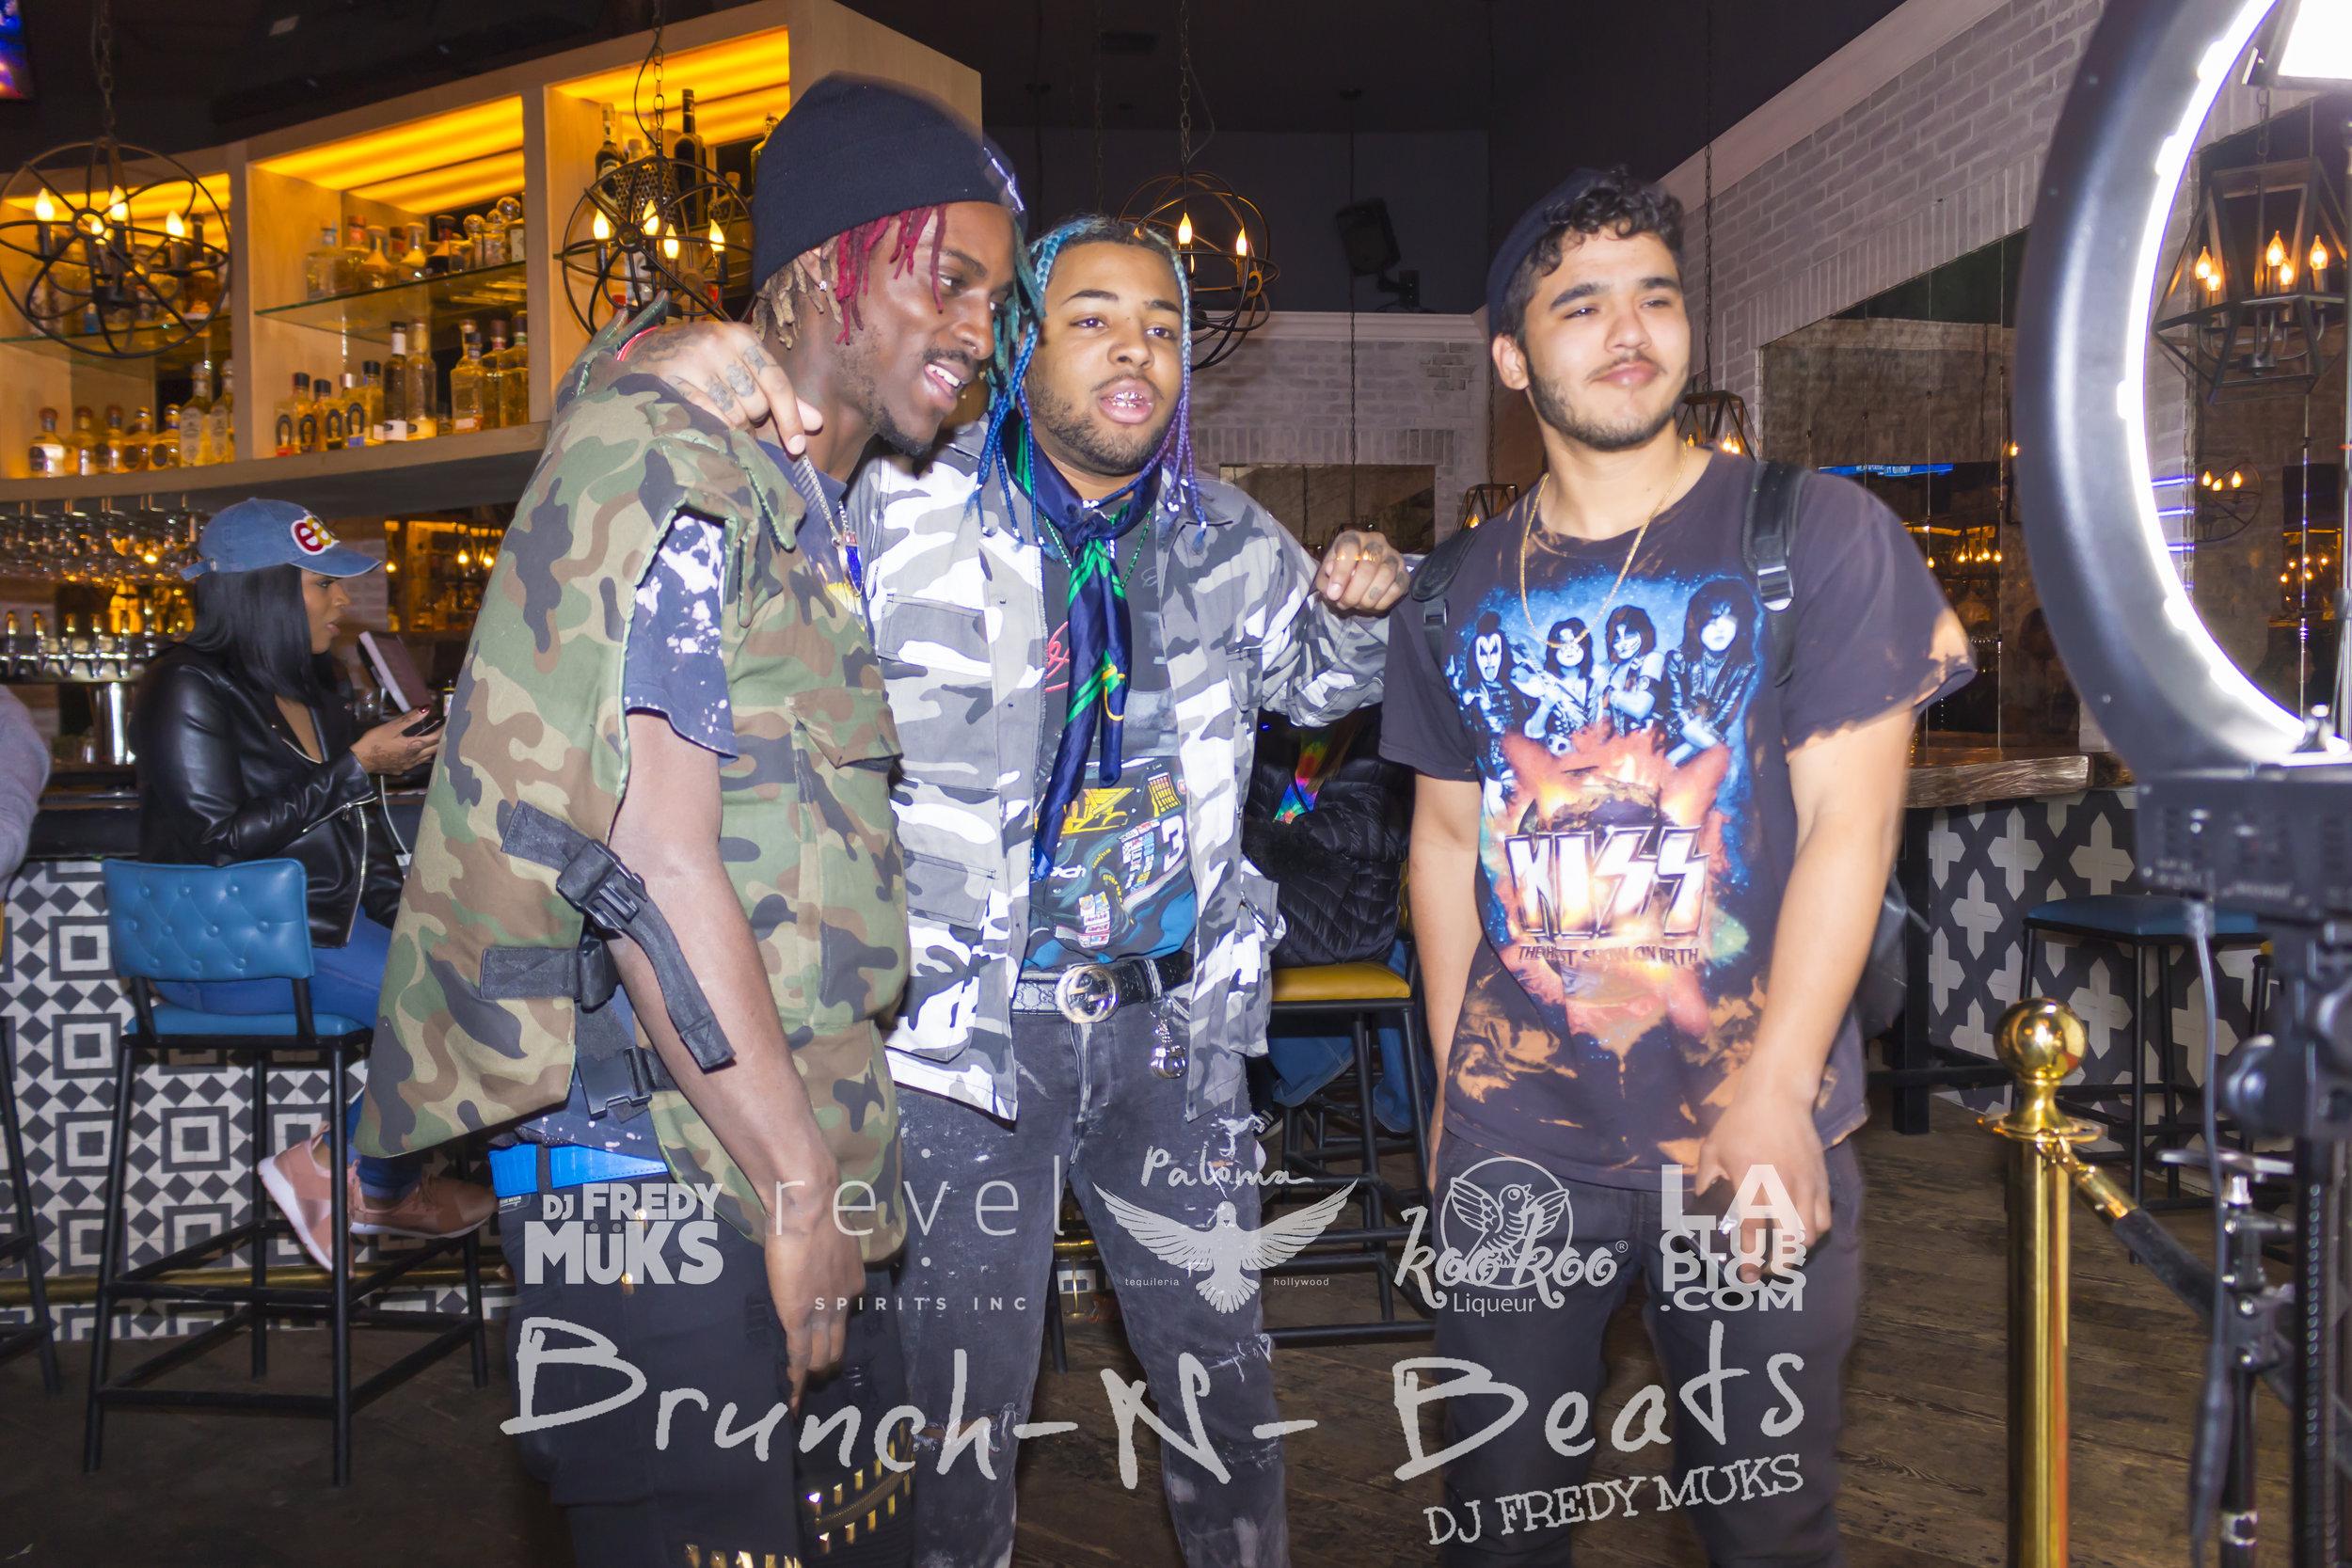 Brunch-N-Beats - Paloma Hollywood - 02-25-18_230.jpg